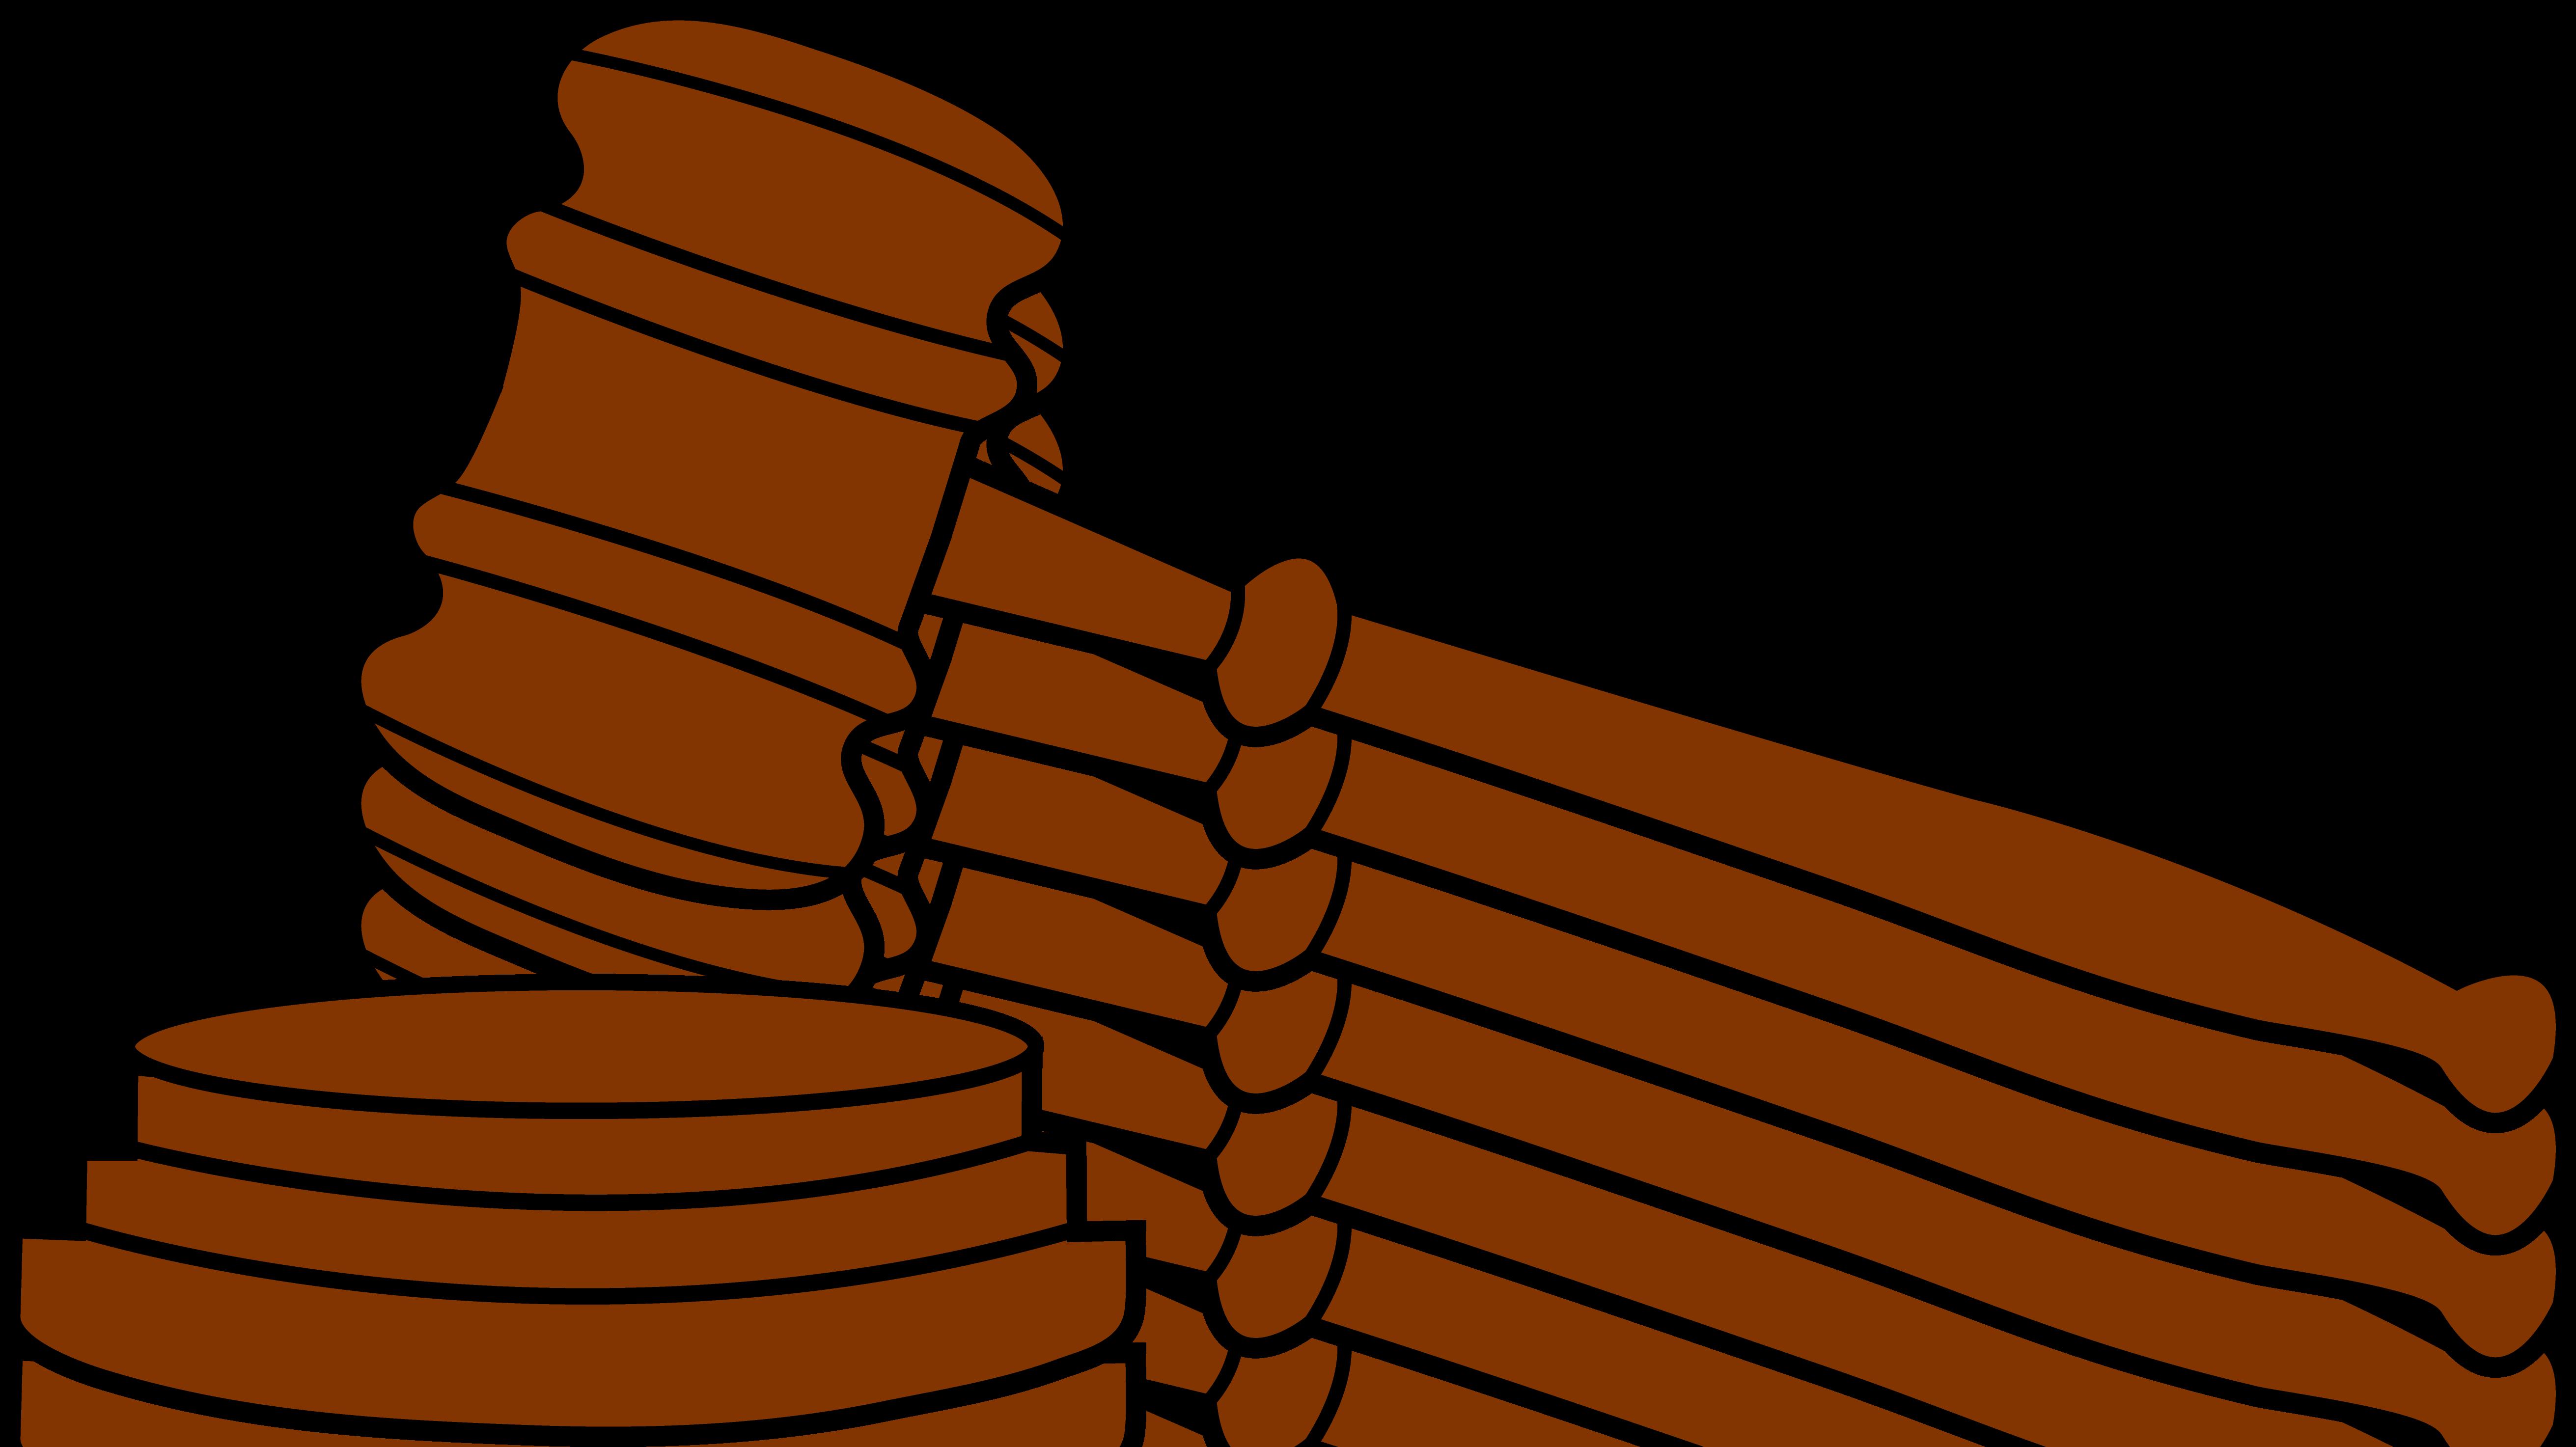 Legal Clipart. Law Clipart